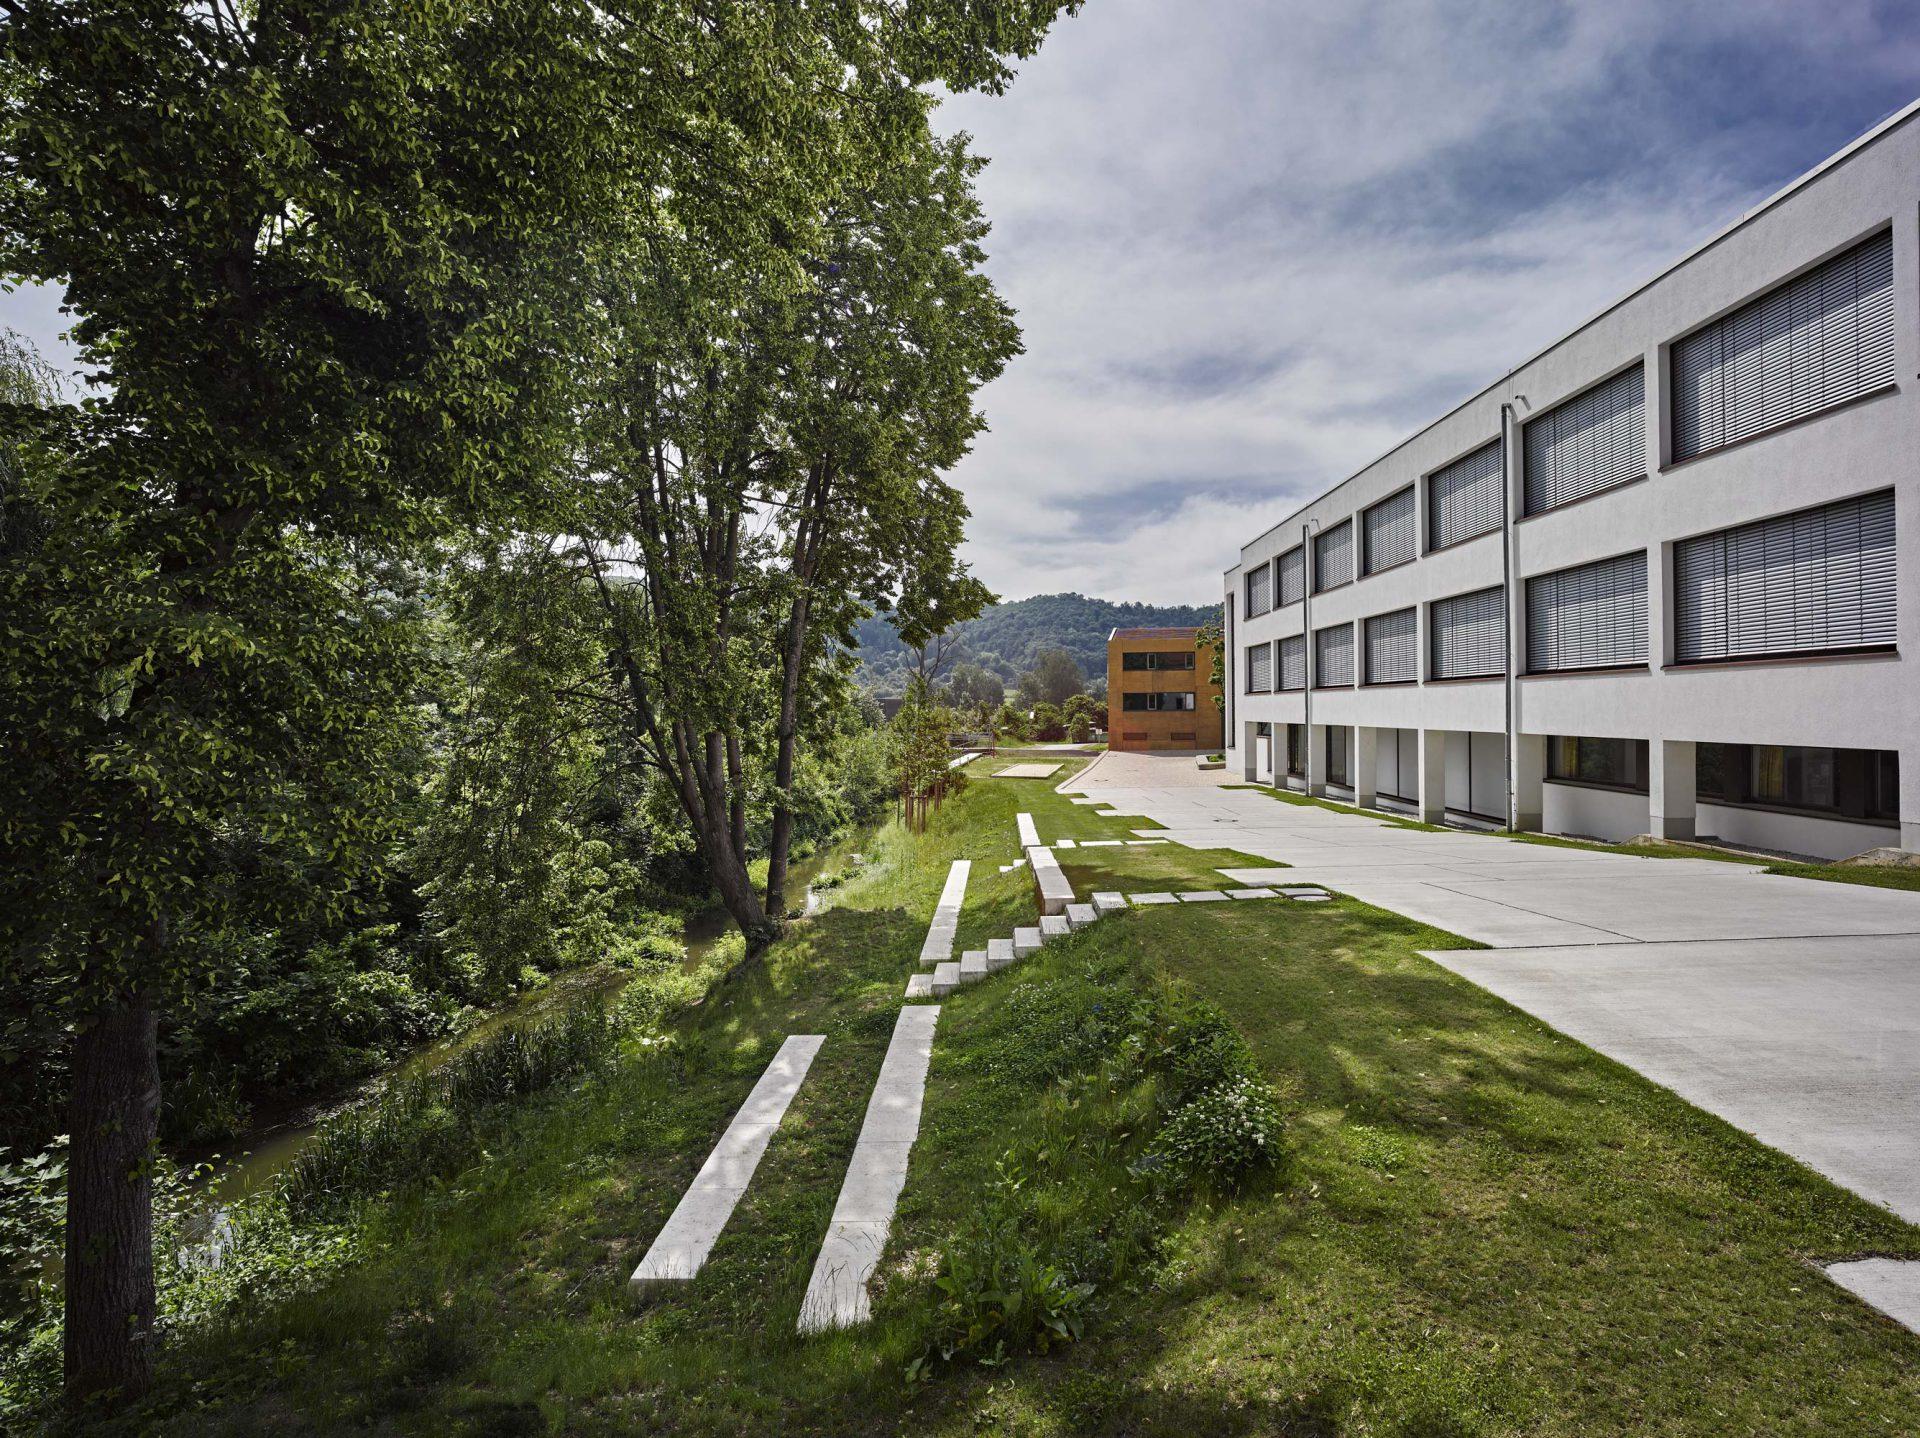 LAW-Rebdorf-180529-0036-04